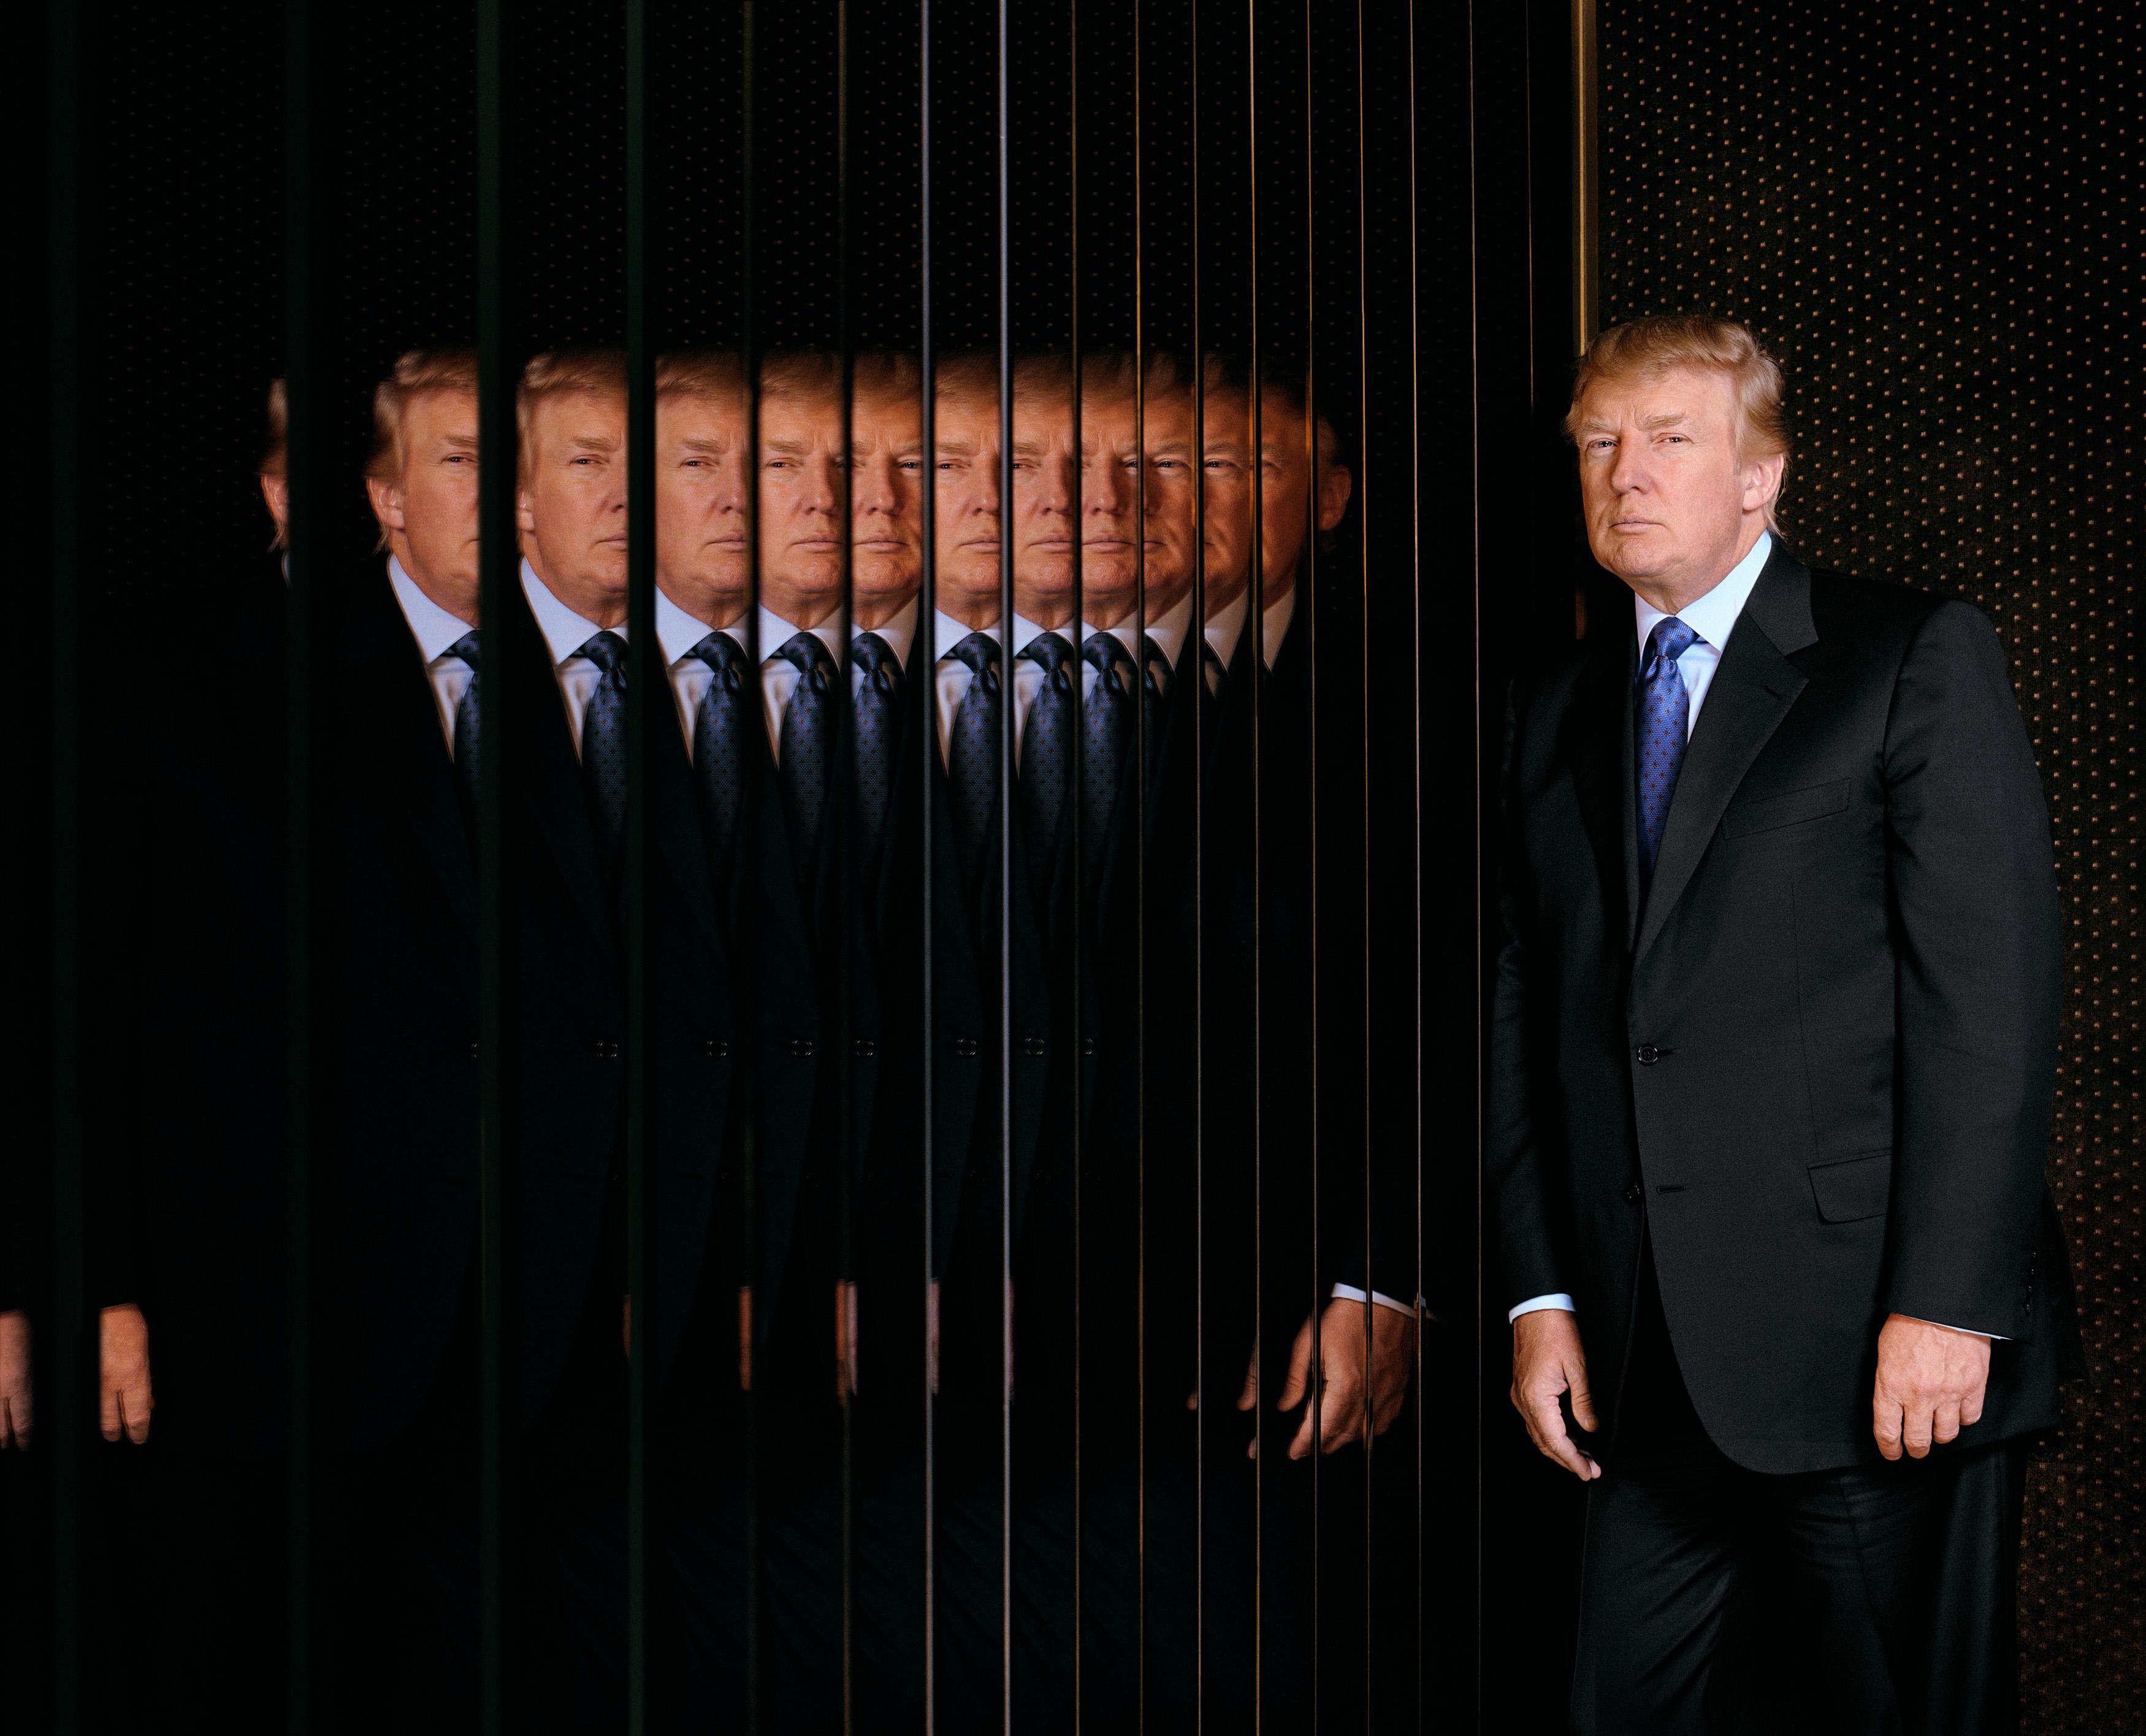 Donald Trump, 2006.